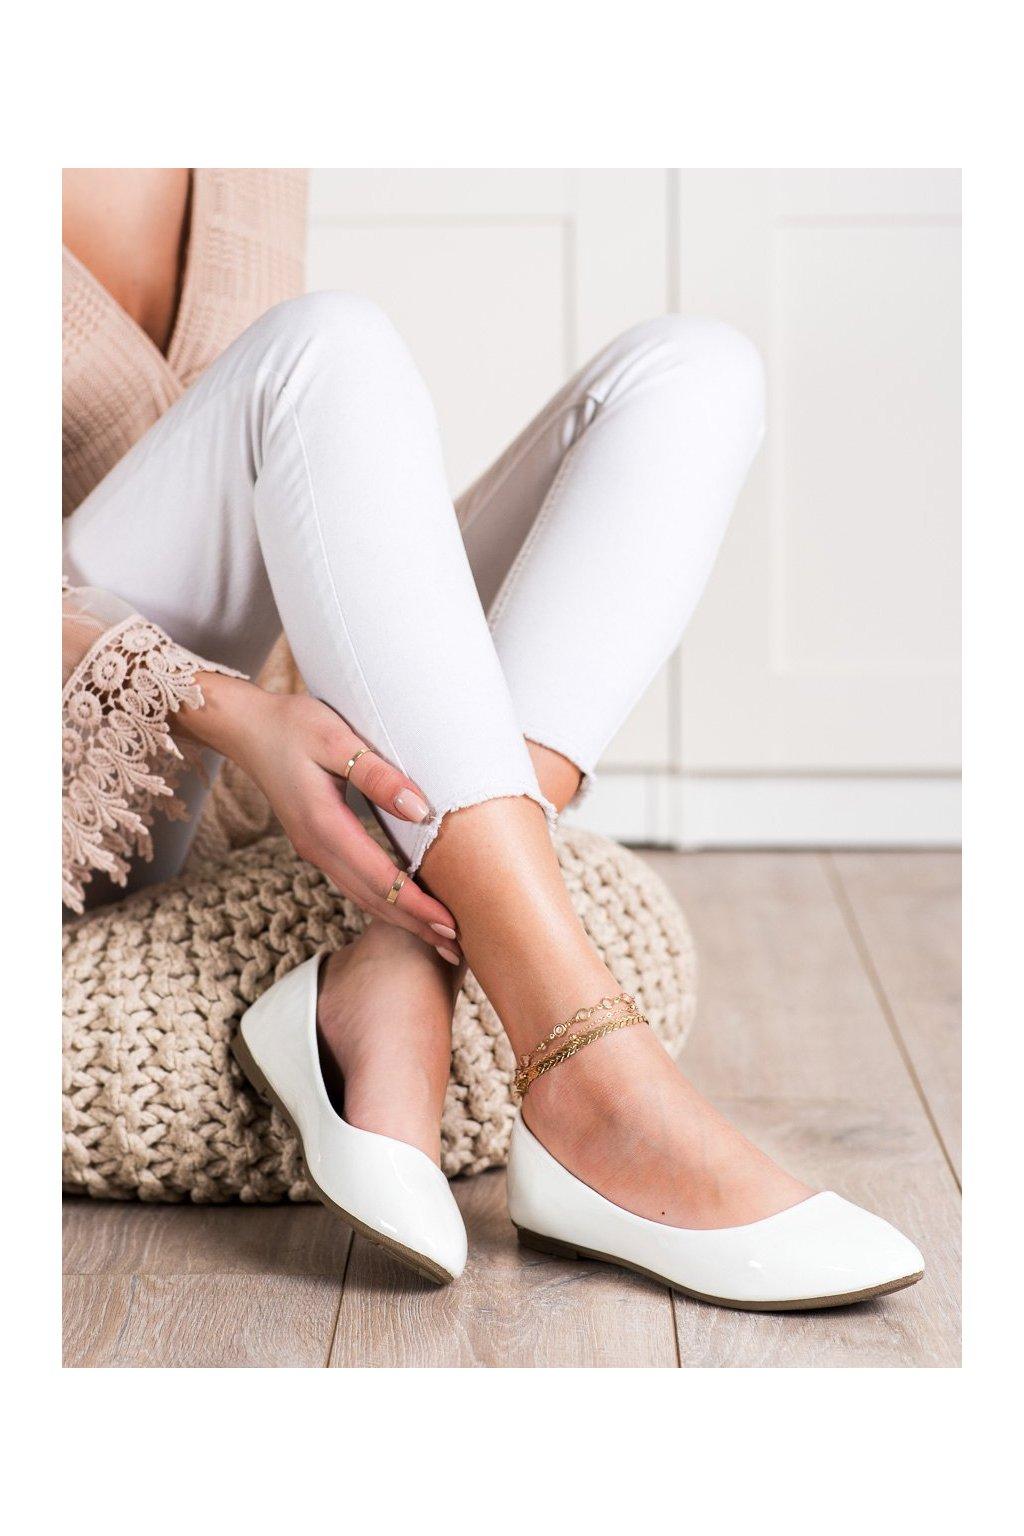 Biele dámske balerínky Diamantique kod 9988-60W